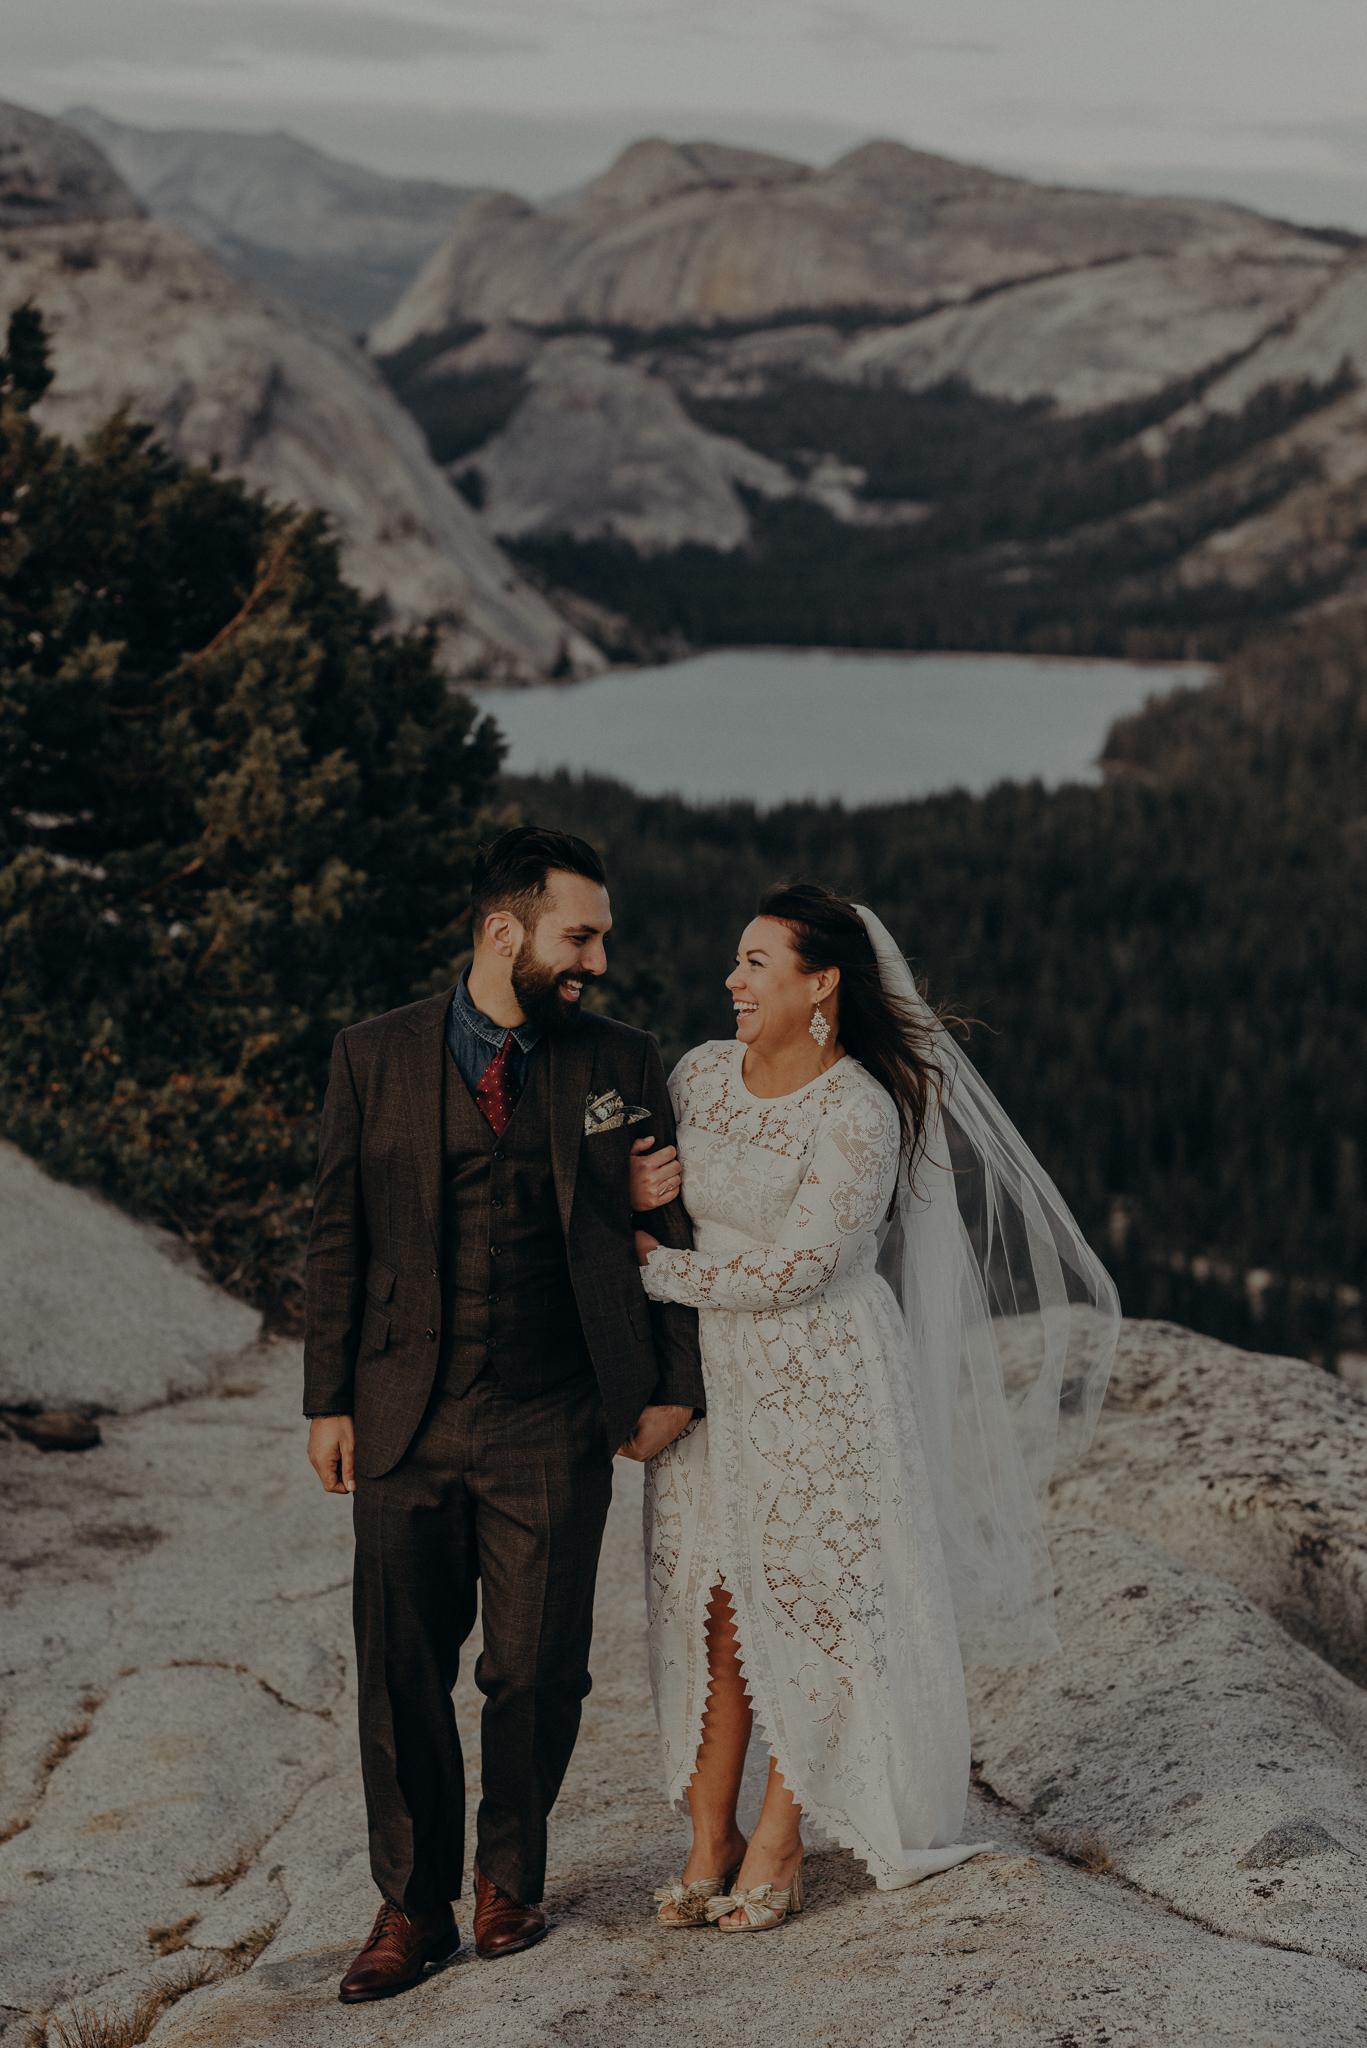 Yosemite Elopement Photographer - Evergreen Lodge Wedding Photographer - IsaiahAndTaylor.com-035.jpg